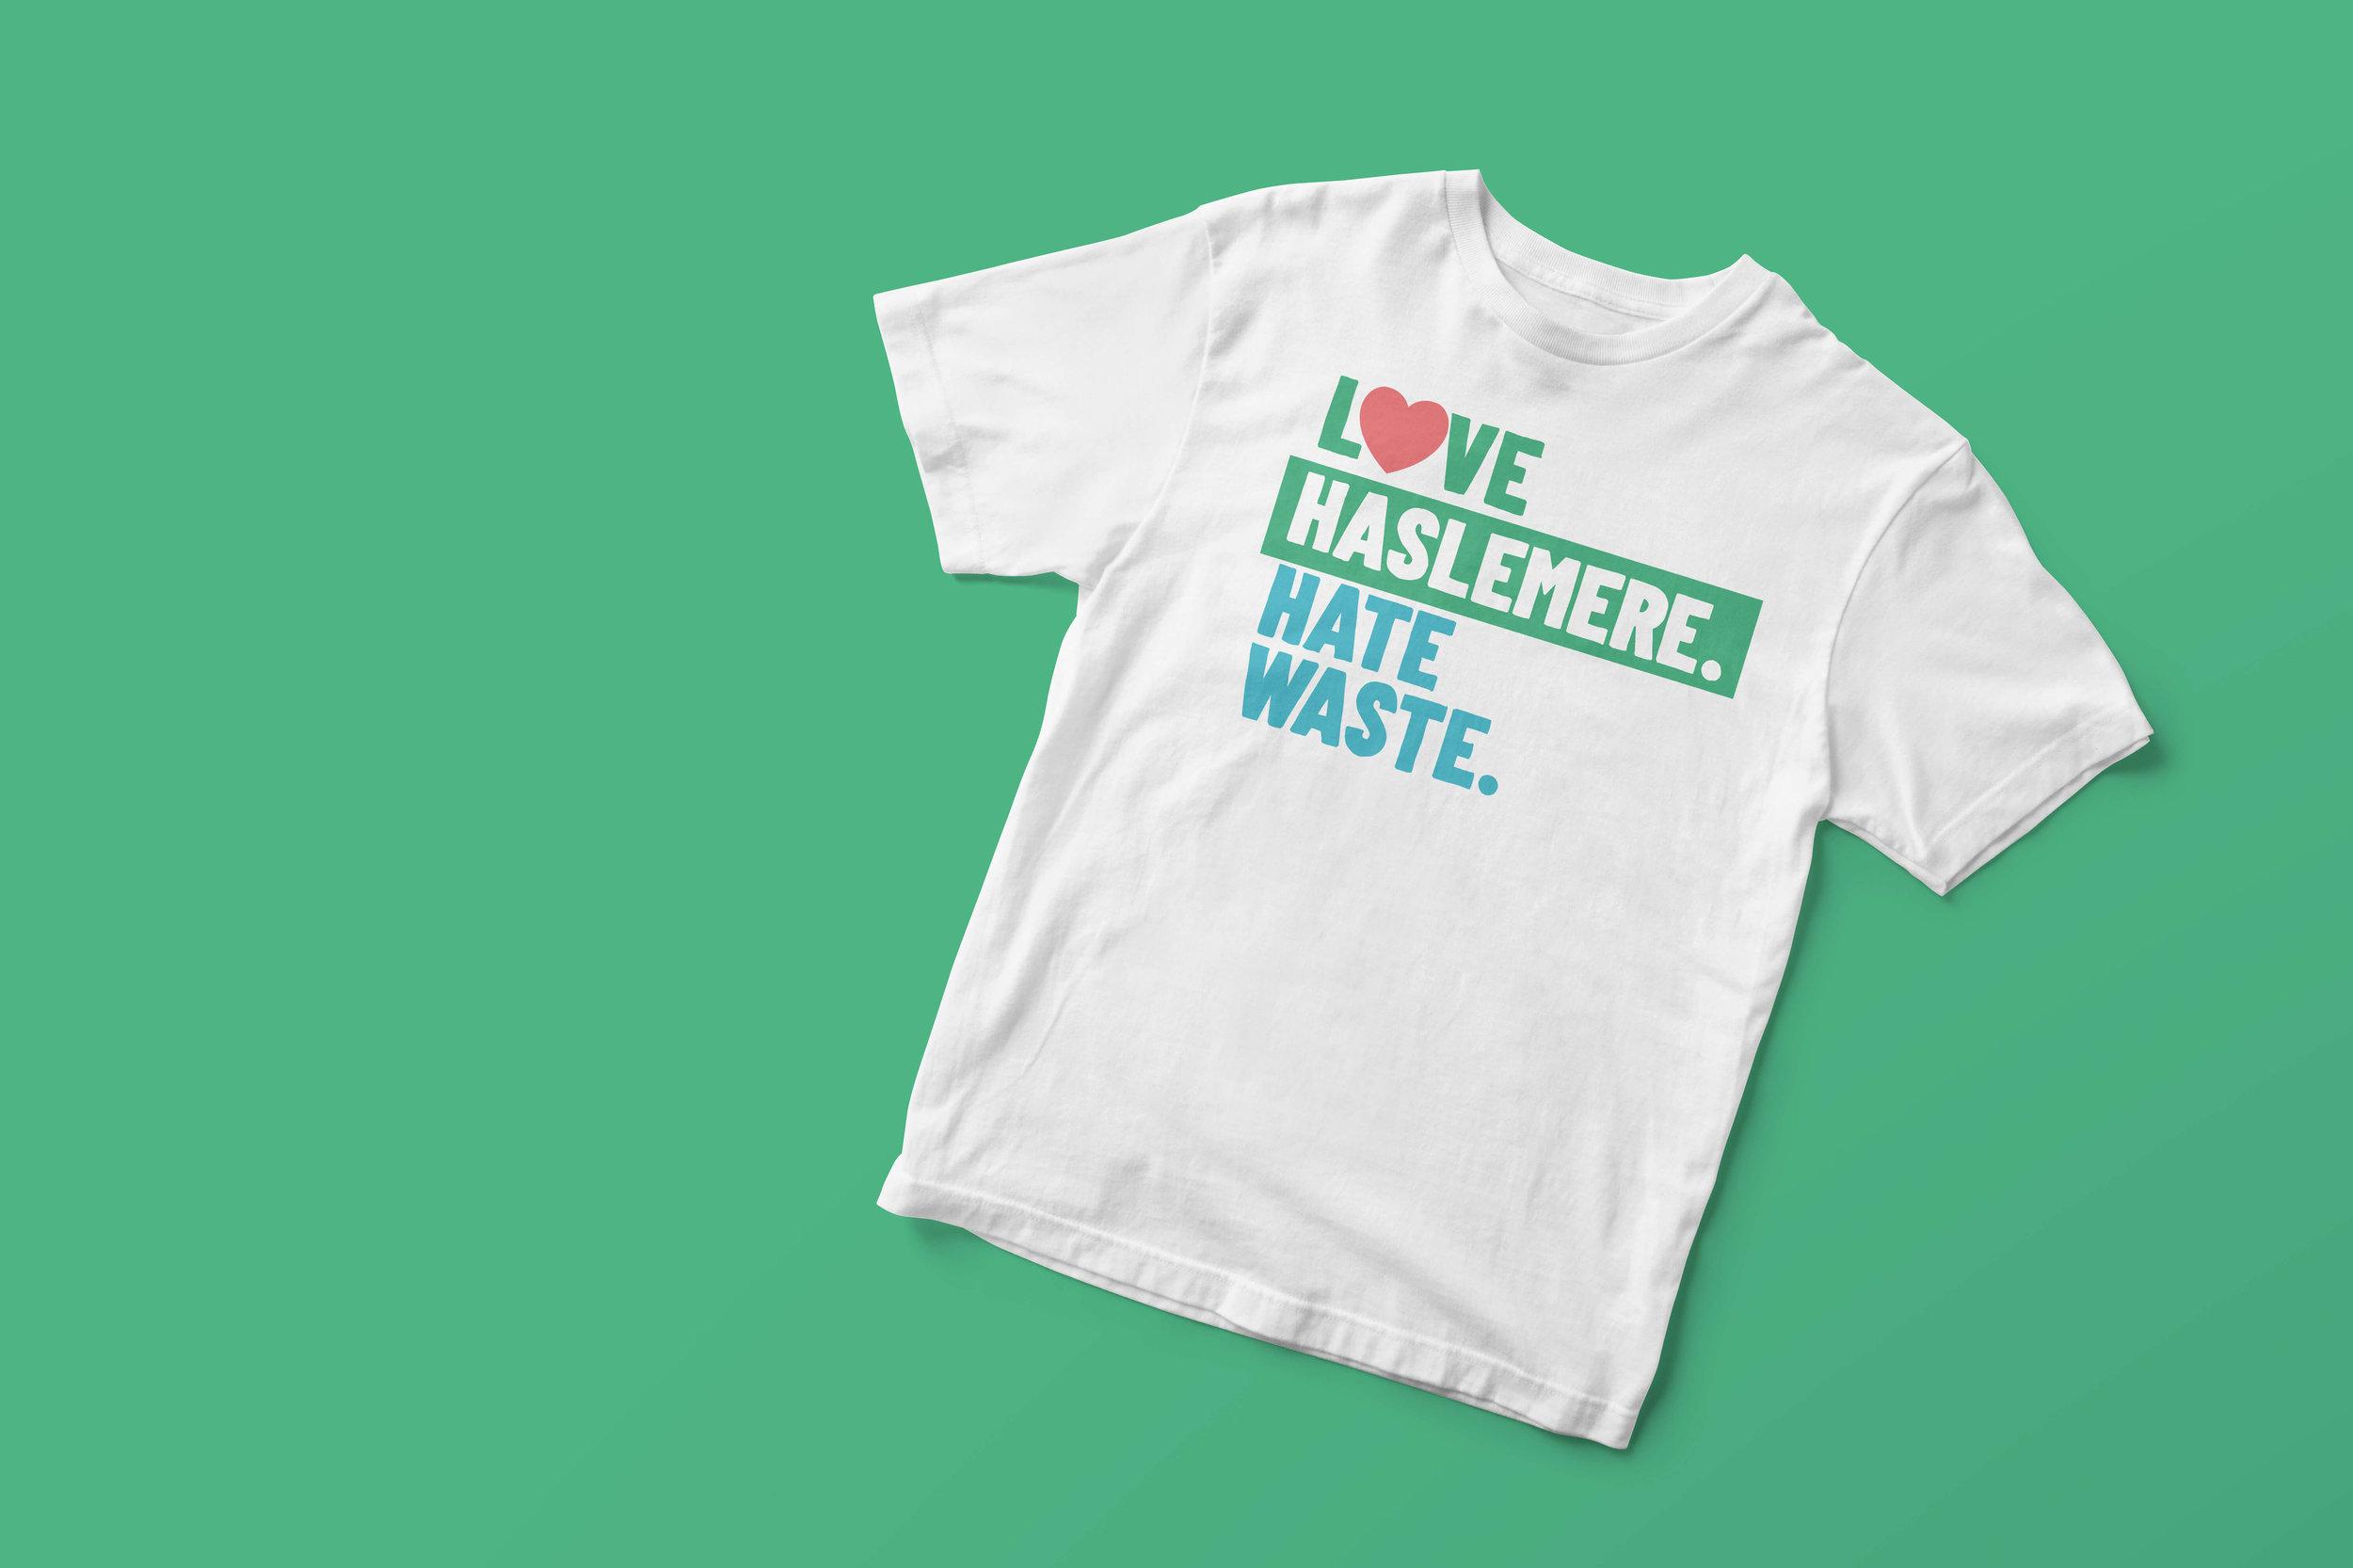 LHHW T-shirt Mockup